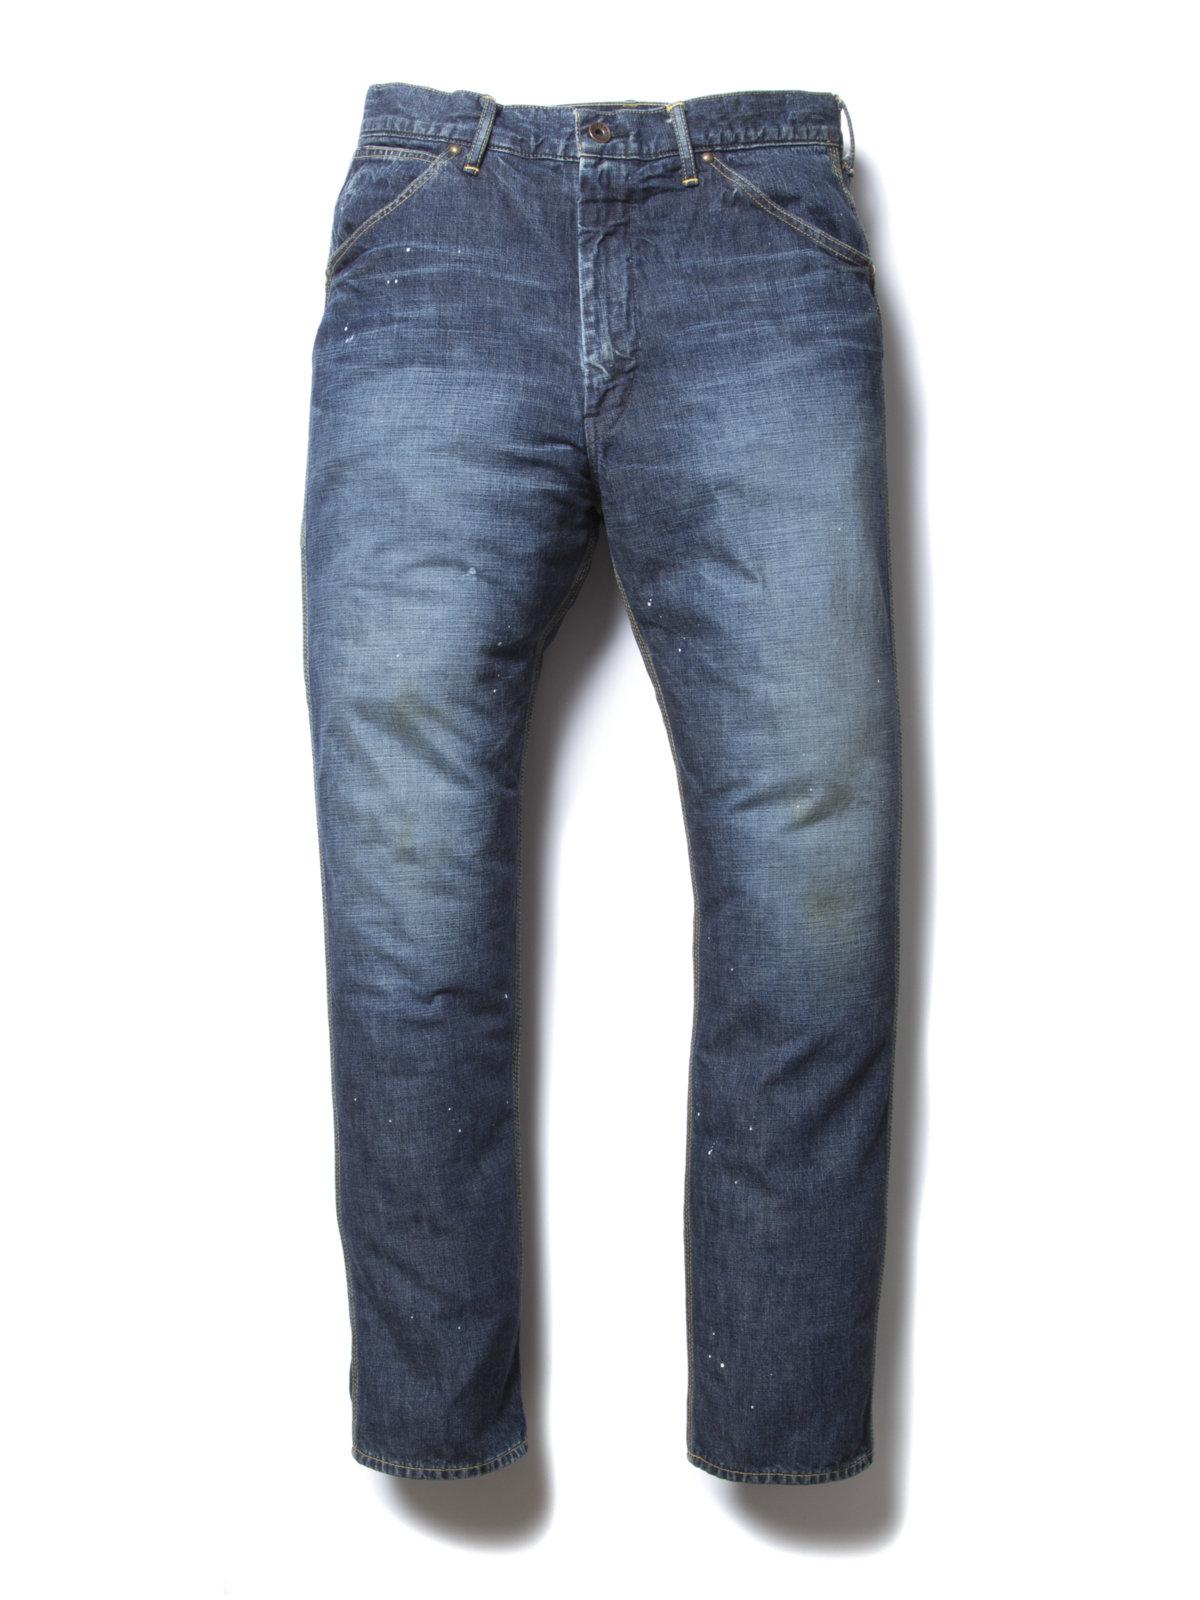 Junkman Painter Pants-Indigo-